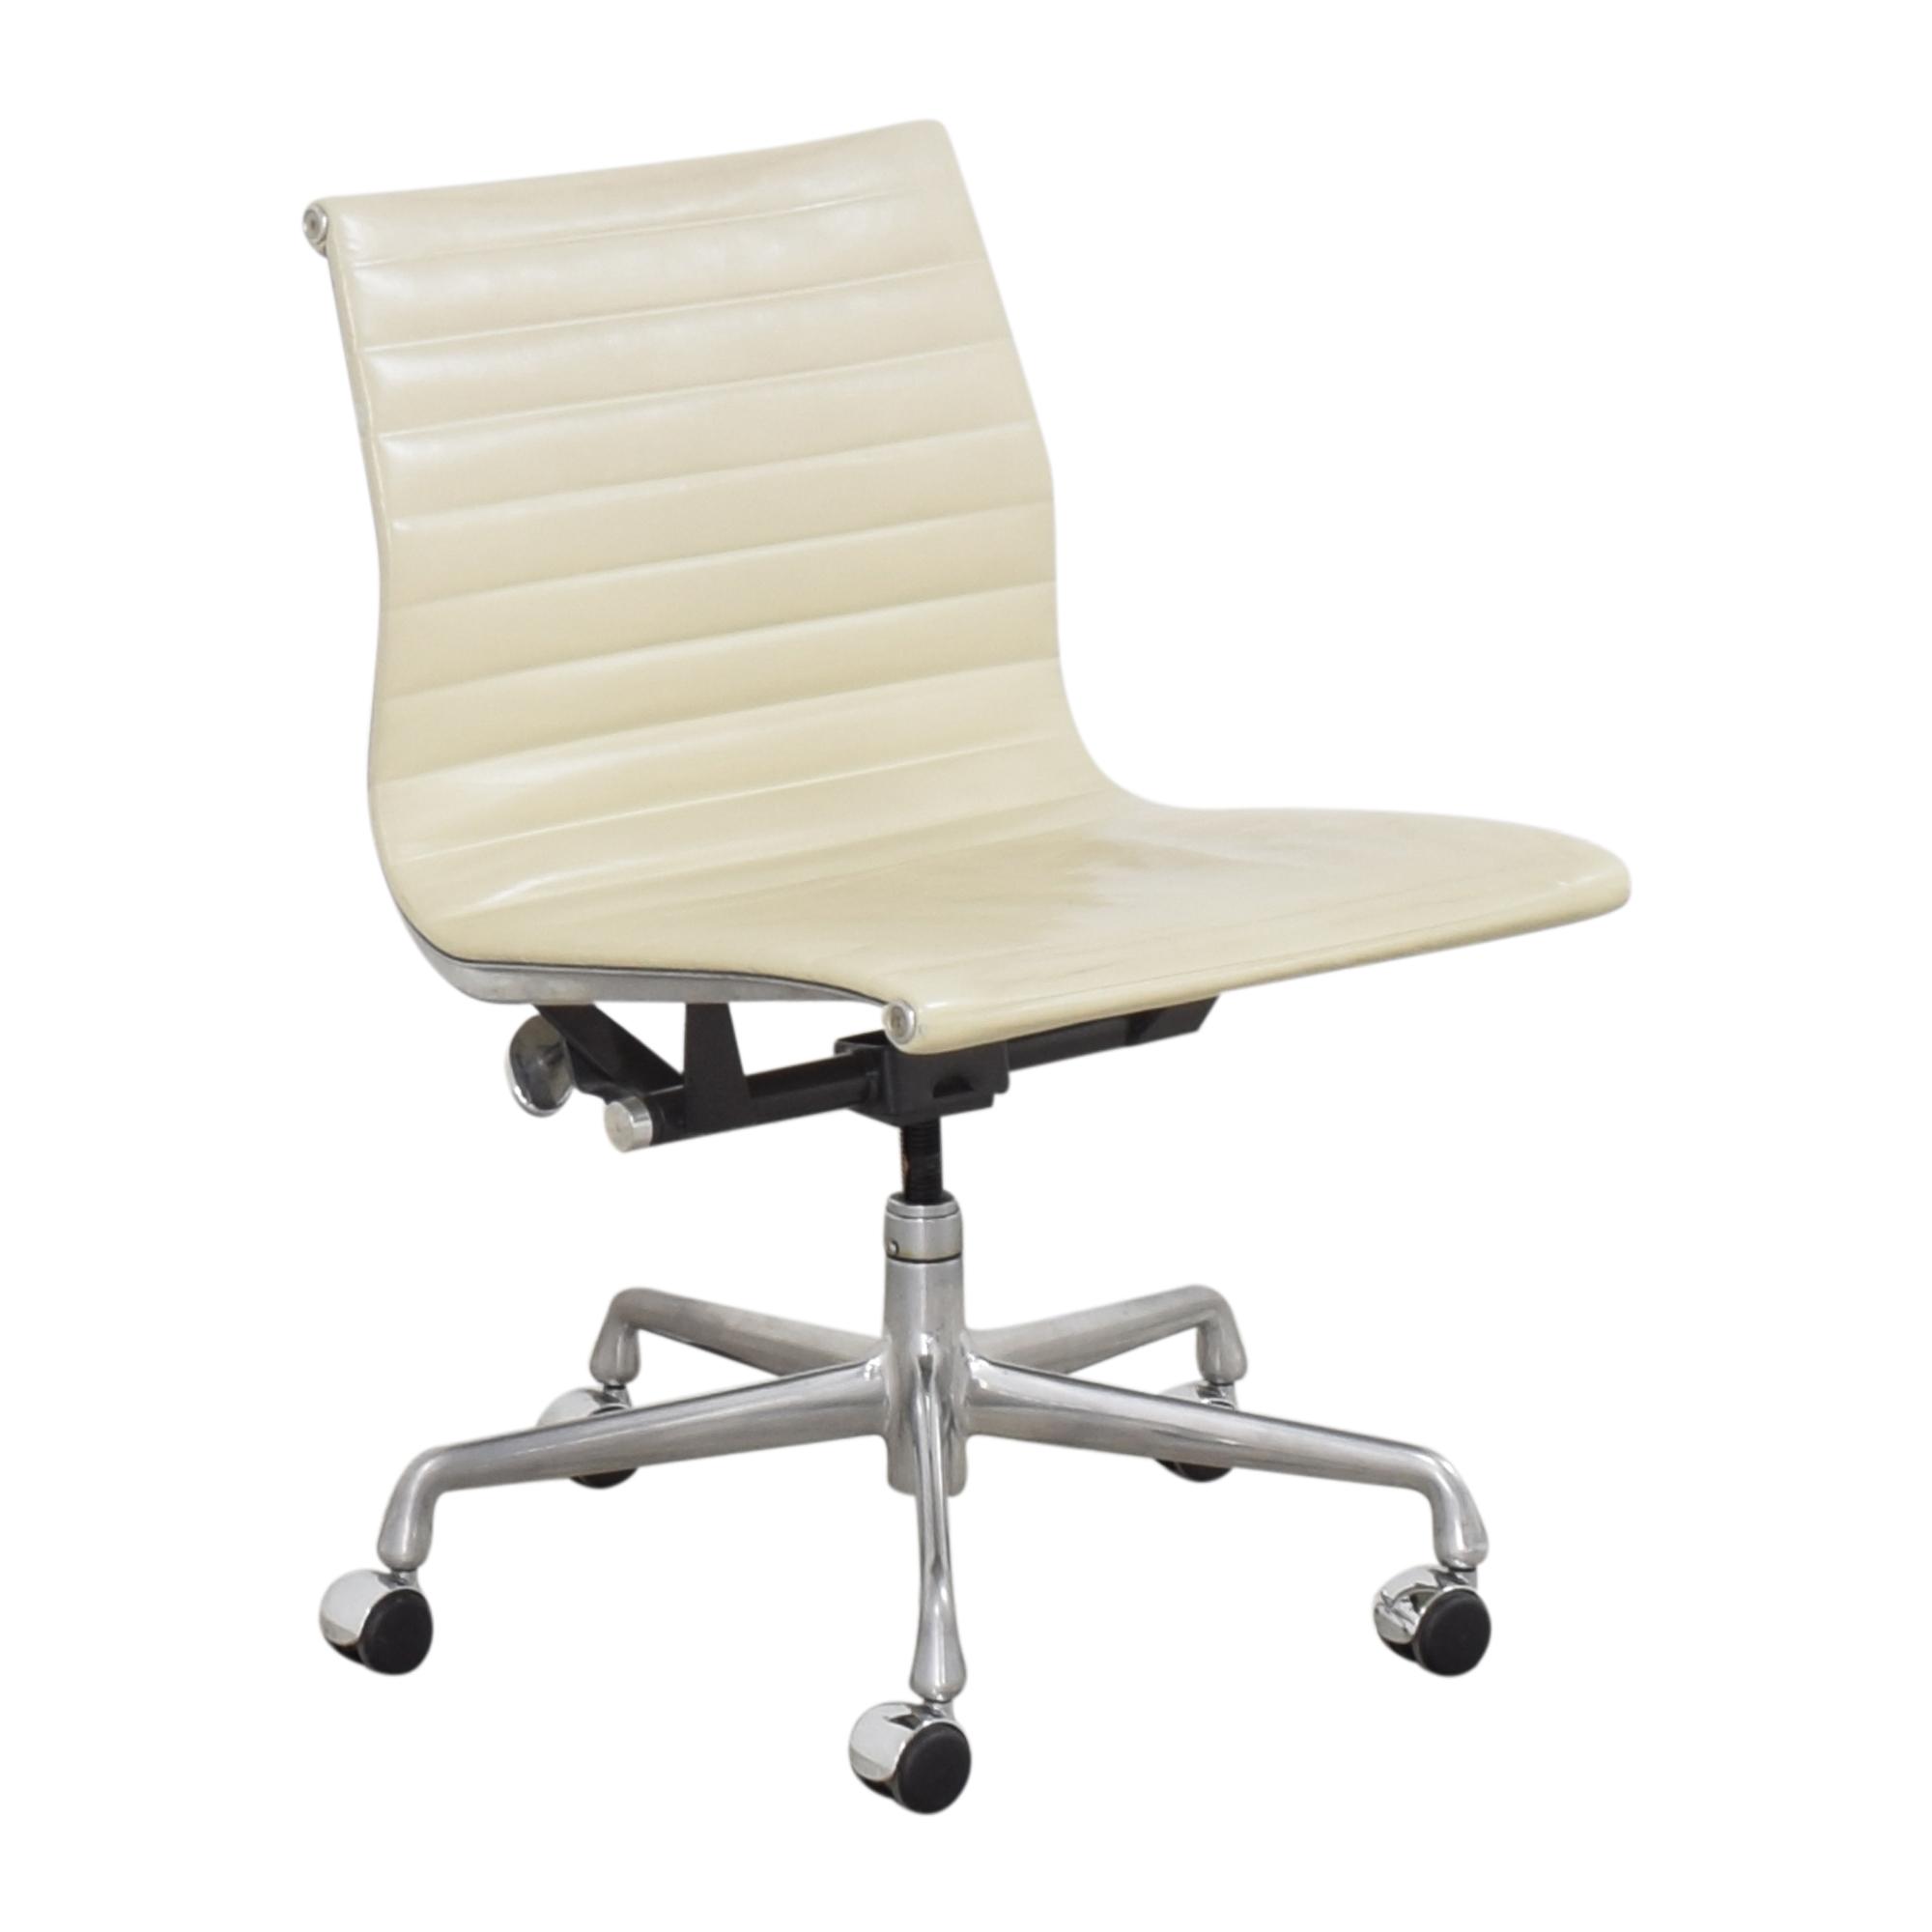 Knoll Knoll Eames Aluminum Group Management Chair nj